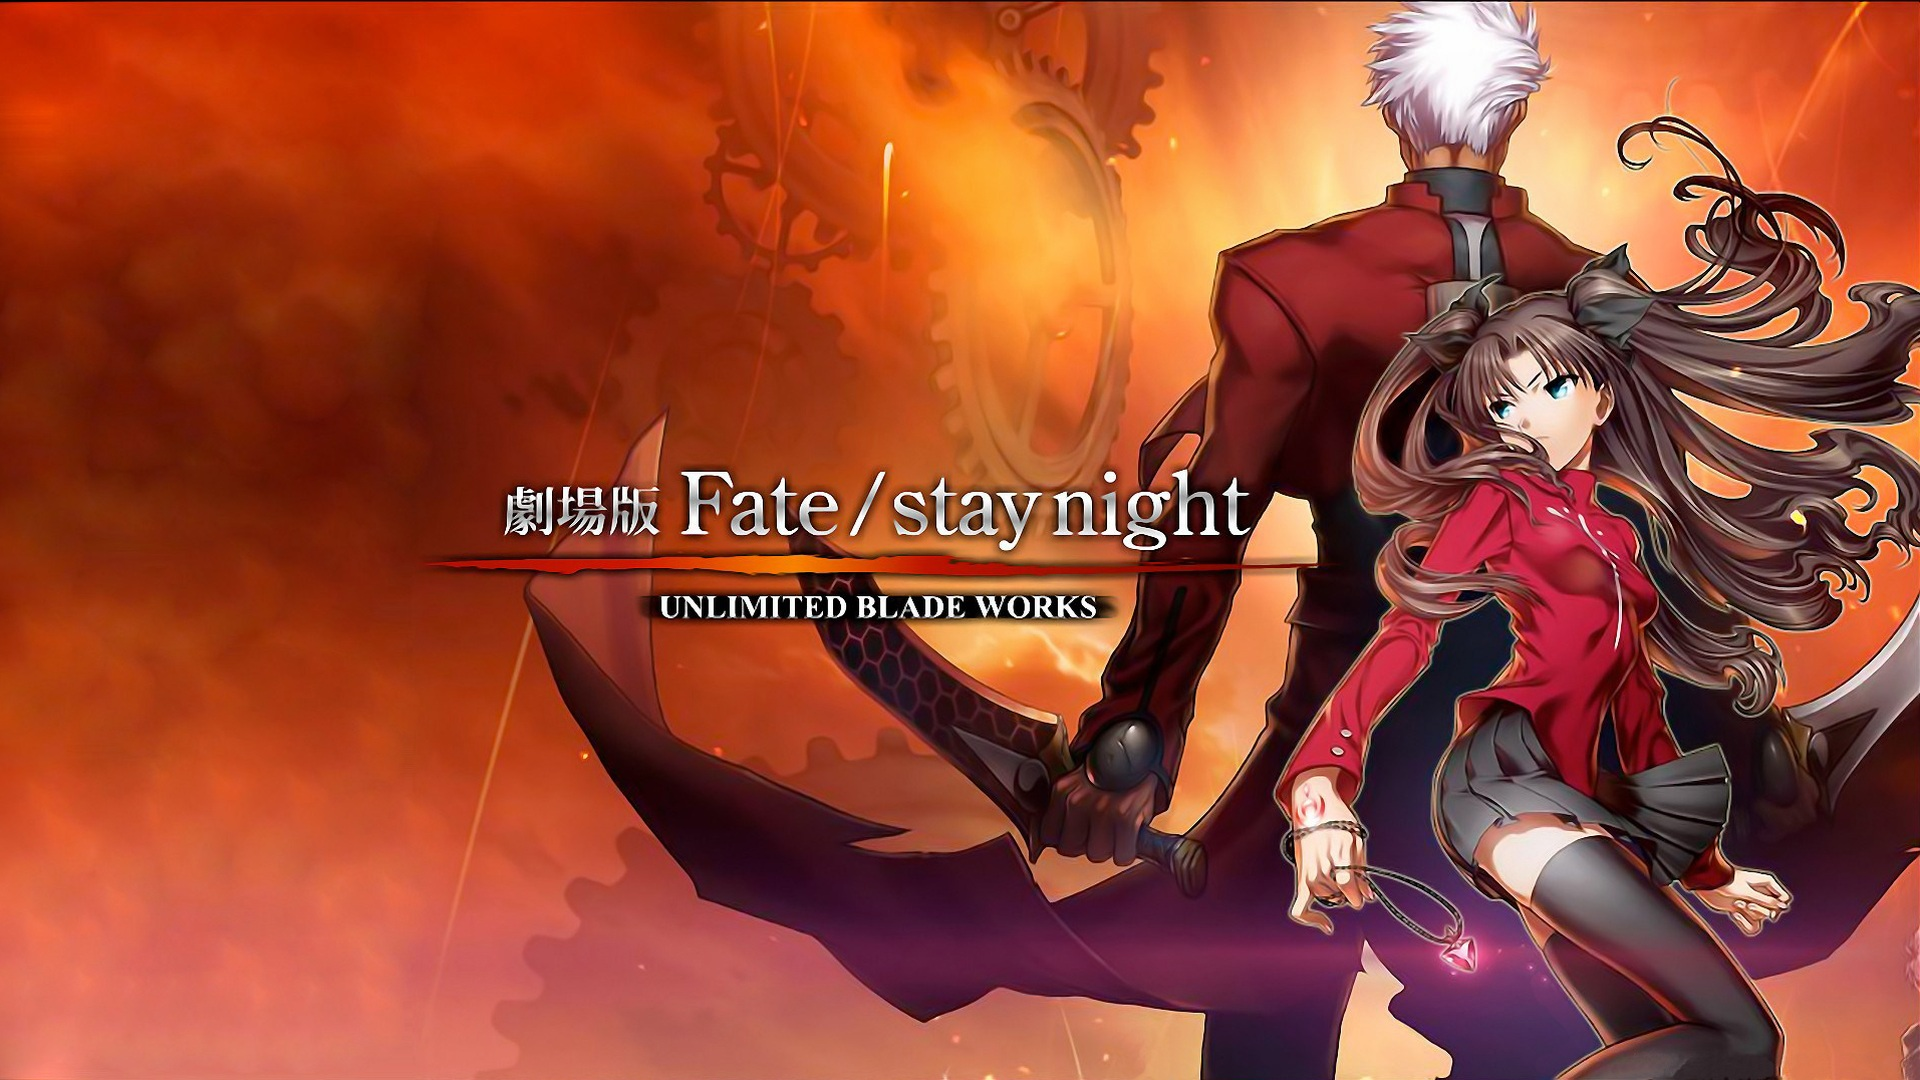 Fate Stay Night Wallpaper Archer 36 Hd Wallpaper   Animewpcom 1920x1080